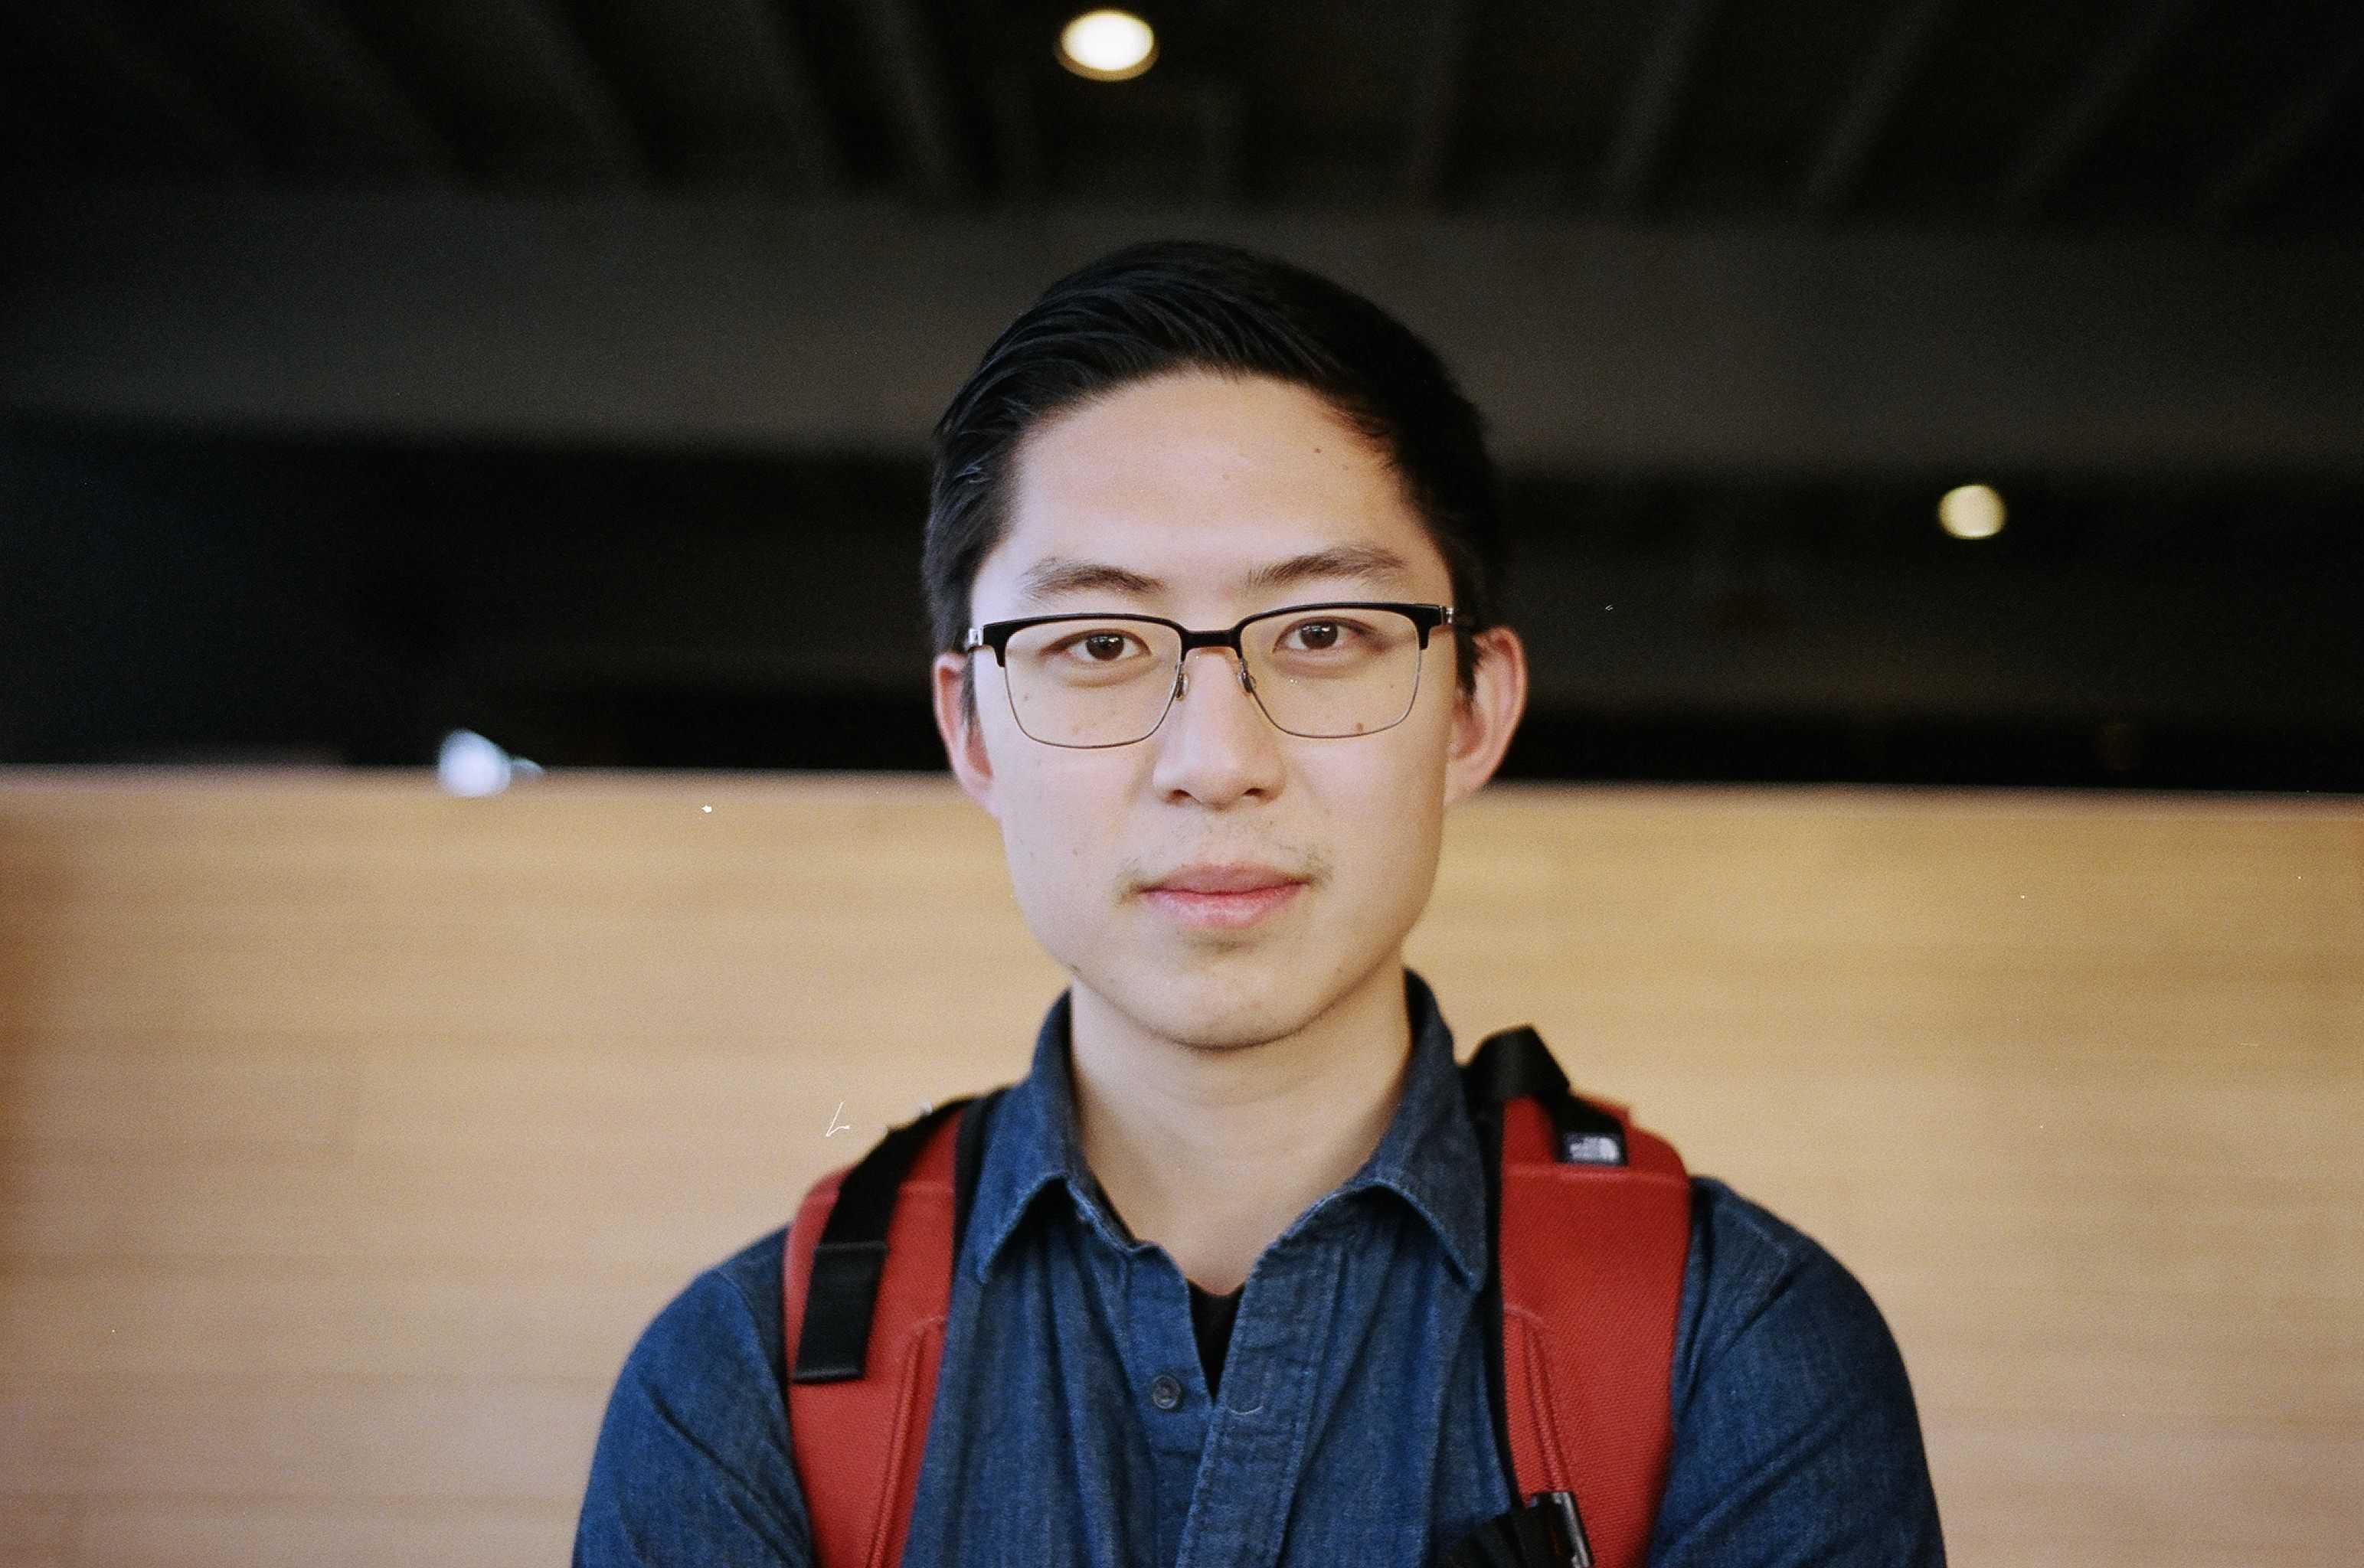 Portrait by Cindy A. Nguyen